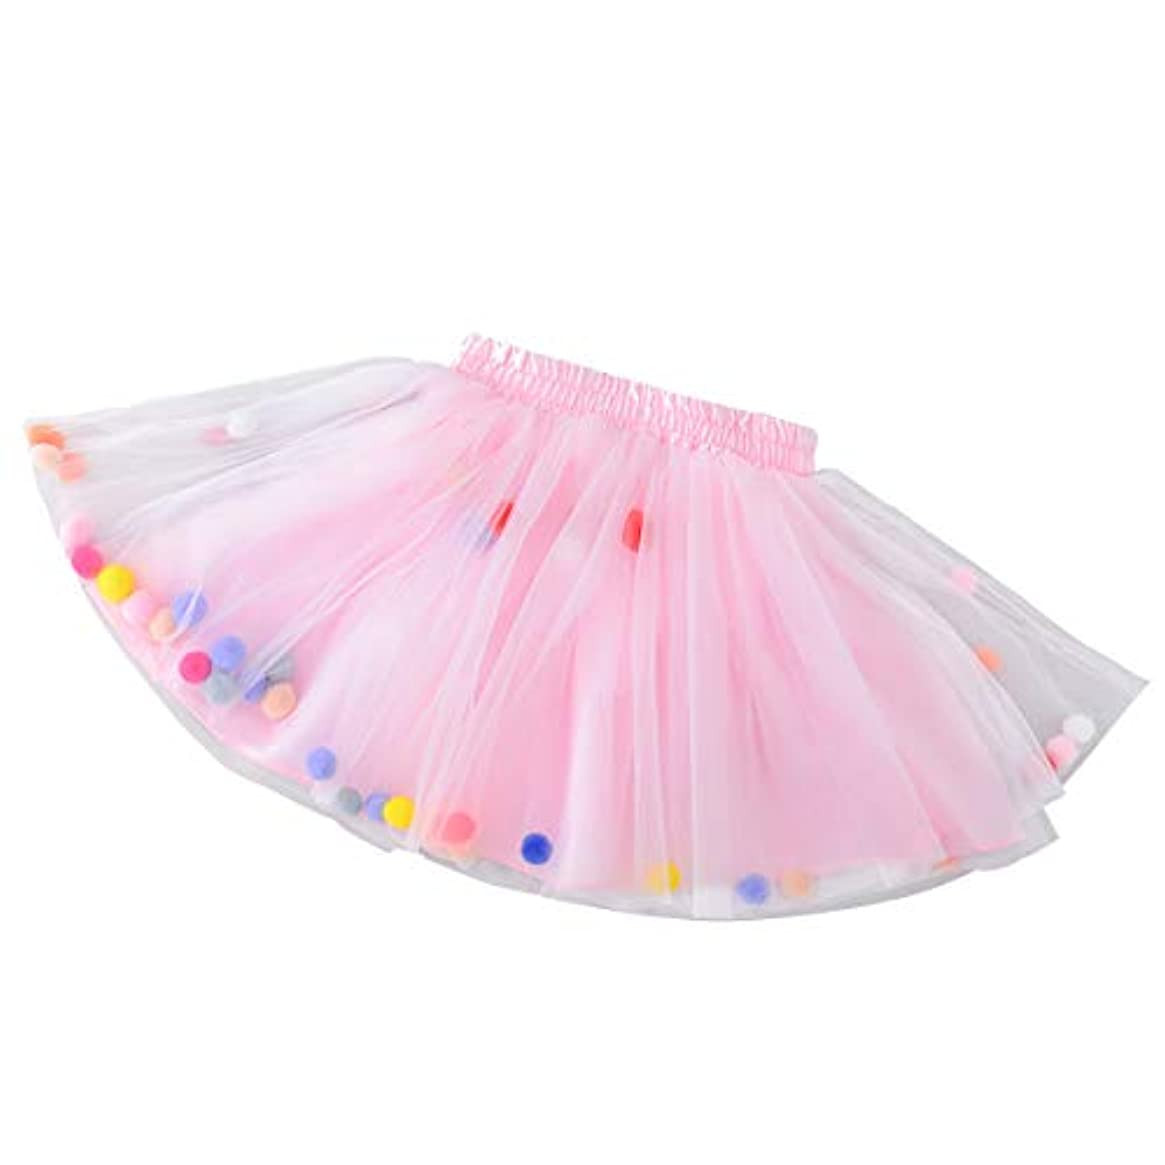 YeahiBaby 子供チュチュスカートラブリーピンクミディスカートカラフルなファジーボールガーゼスカートプリンセスドレス衣装用女の子(サイズxl)